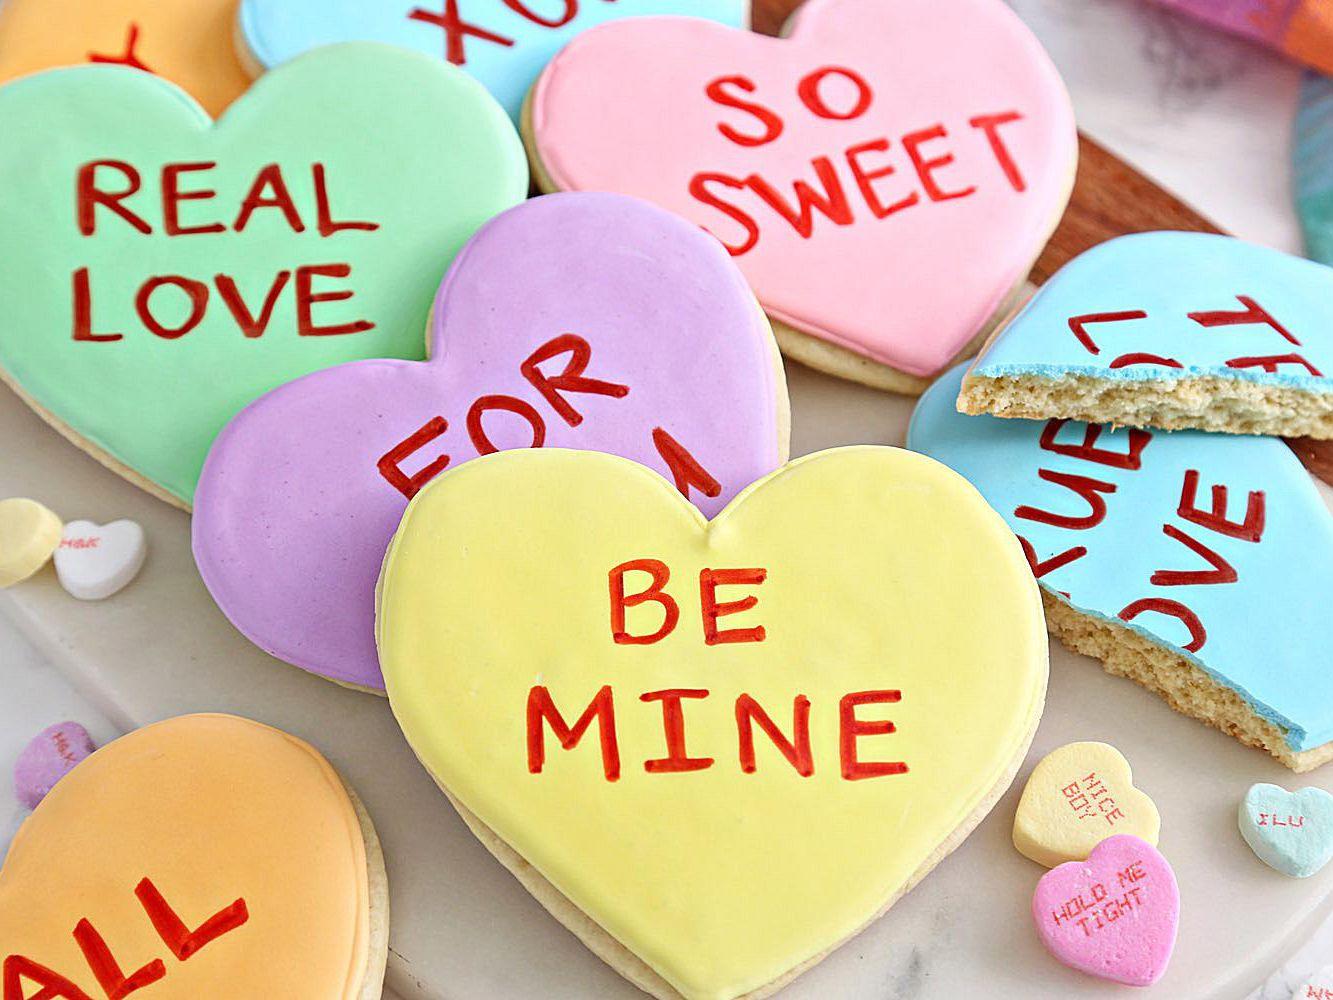 conversation heart sugar cookies 3 589da6725f9b c460ce2